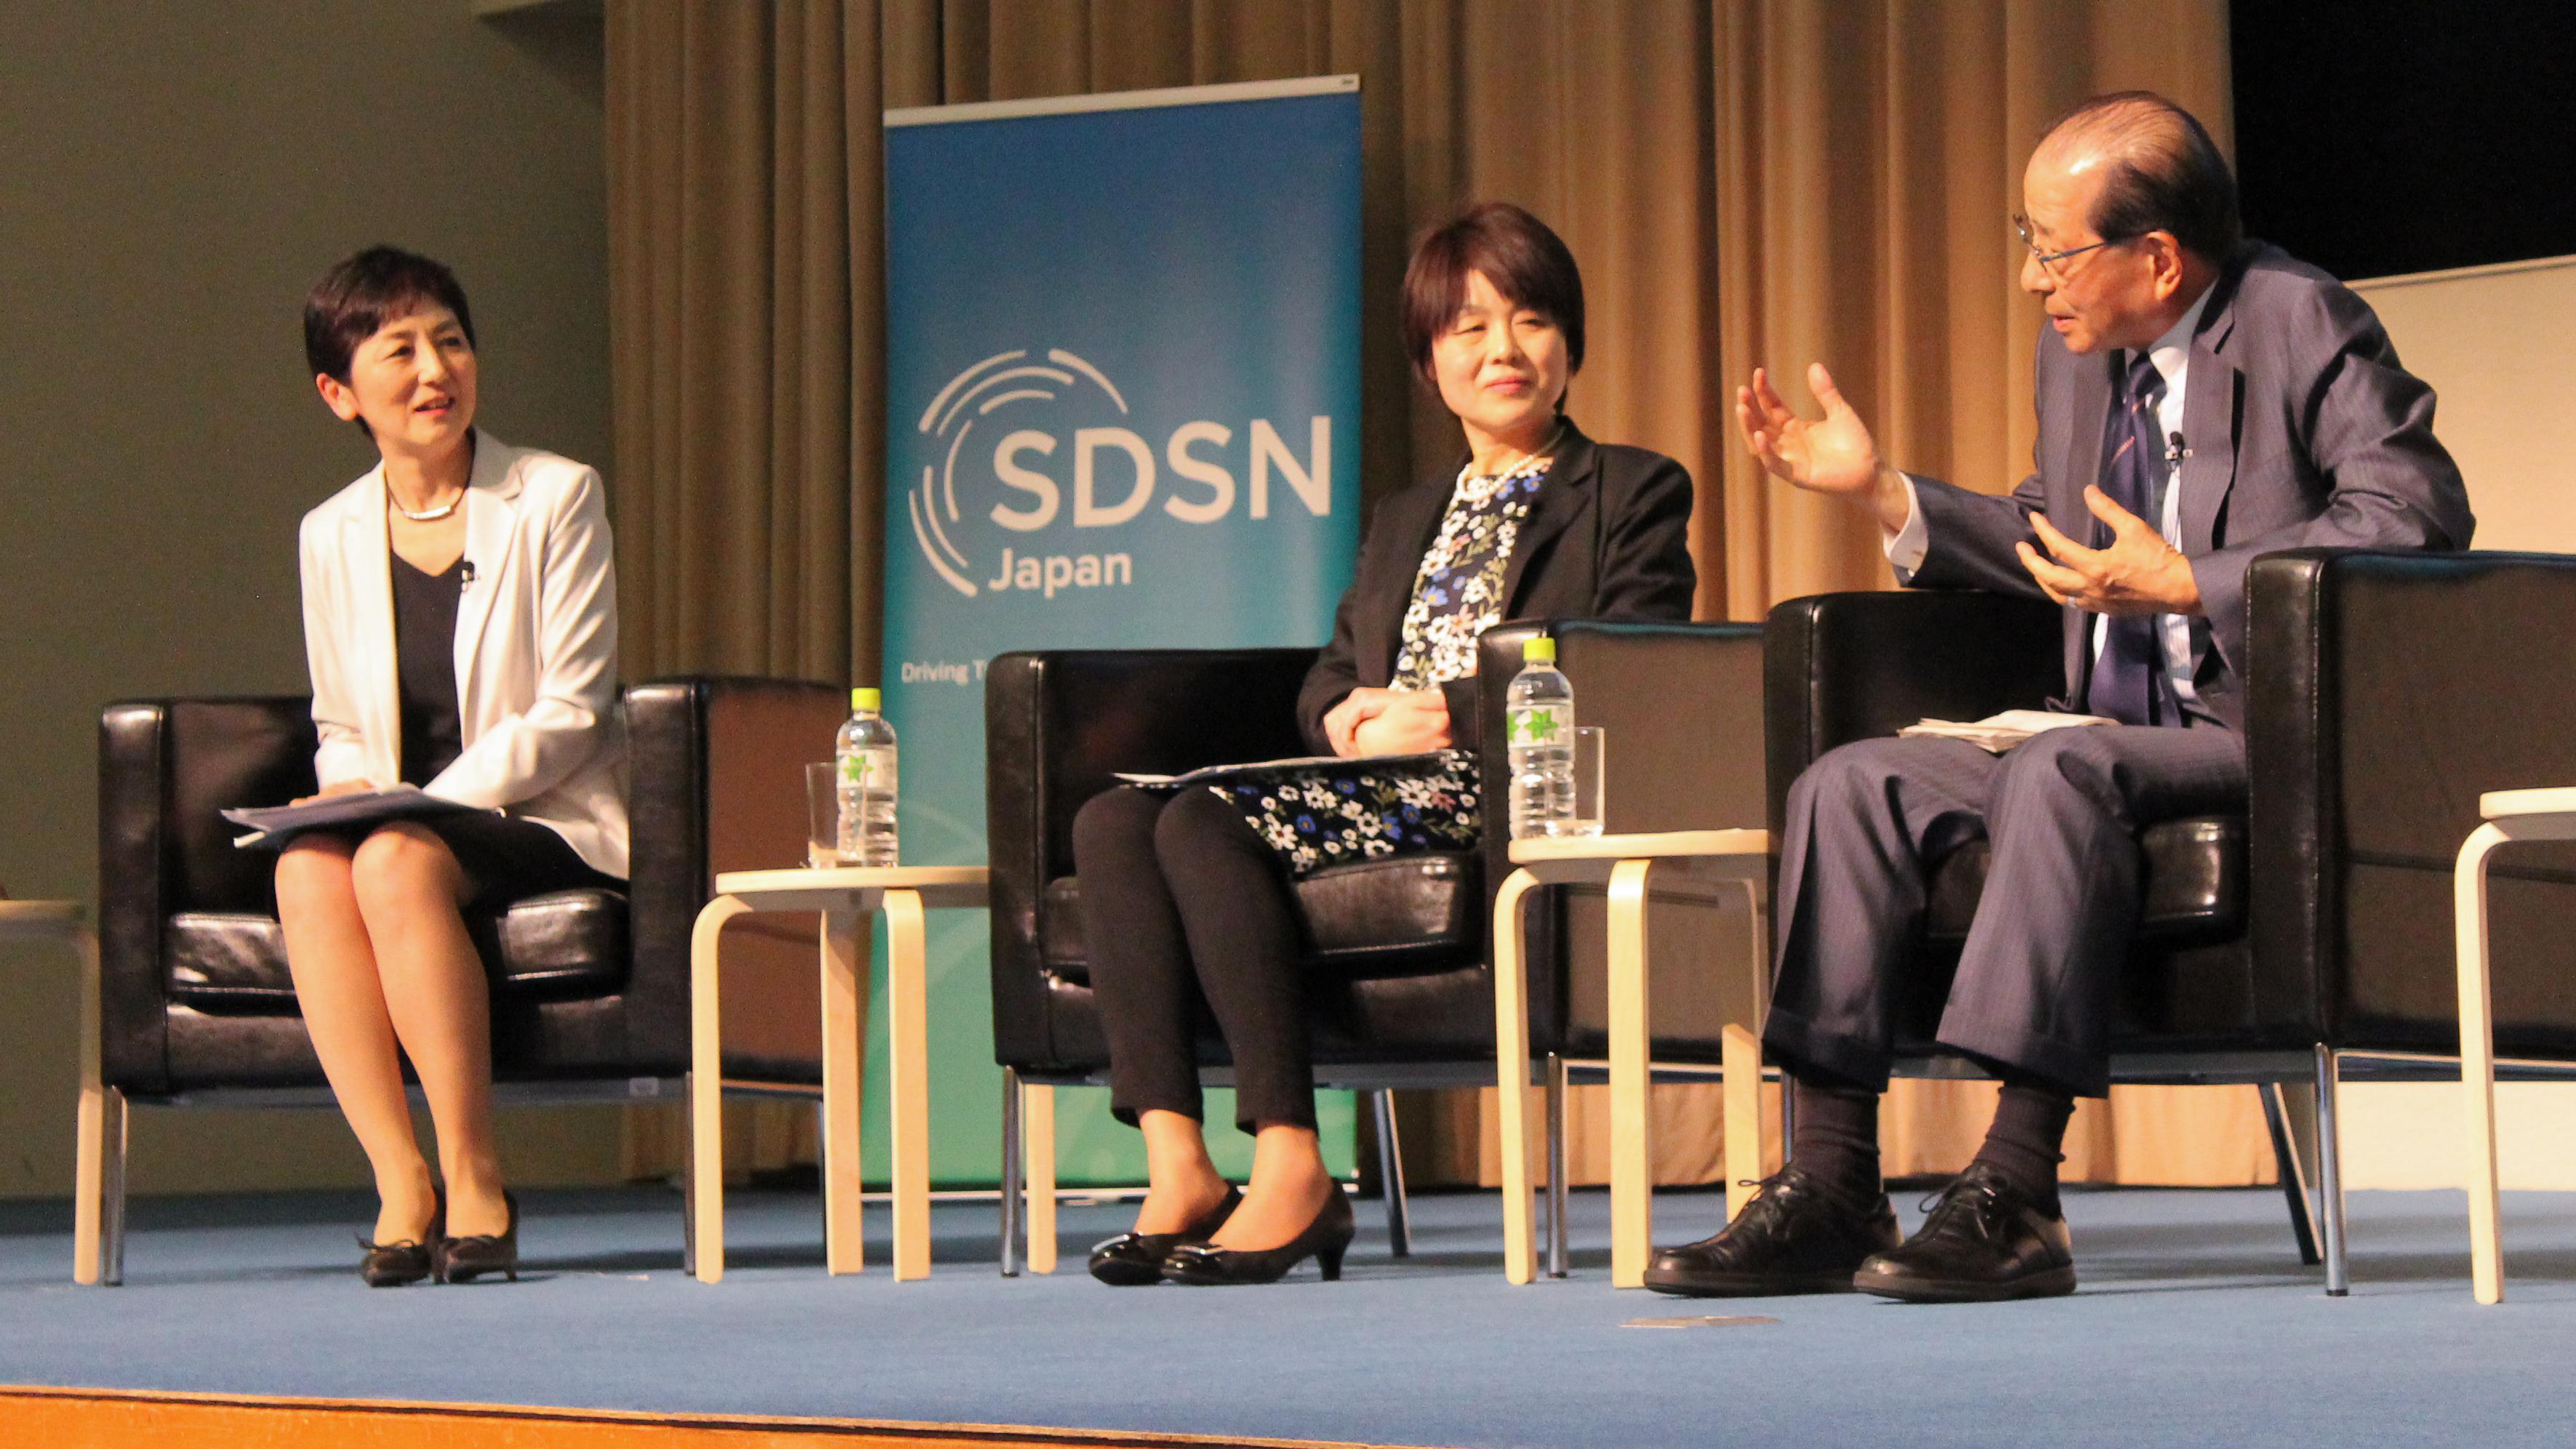 SDSN – banner4